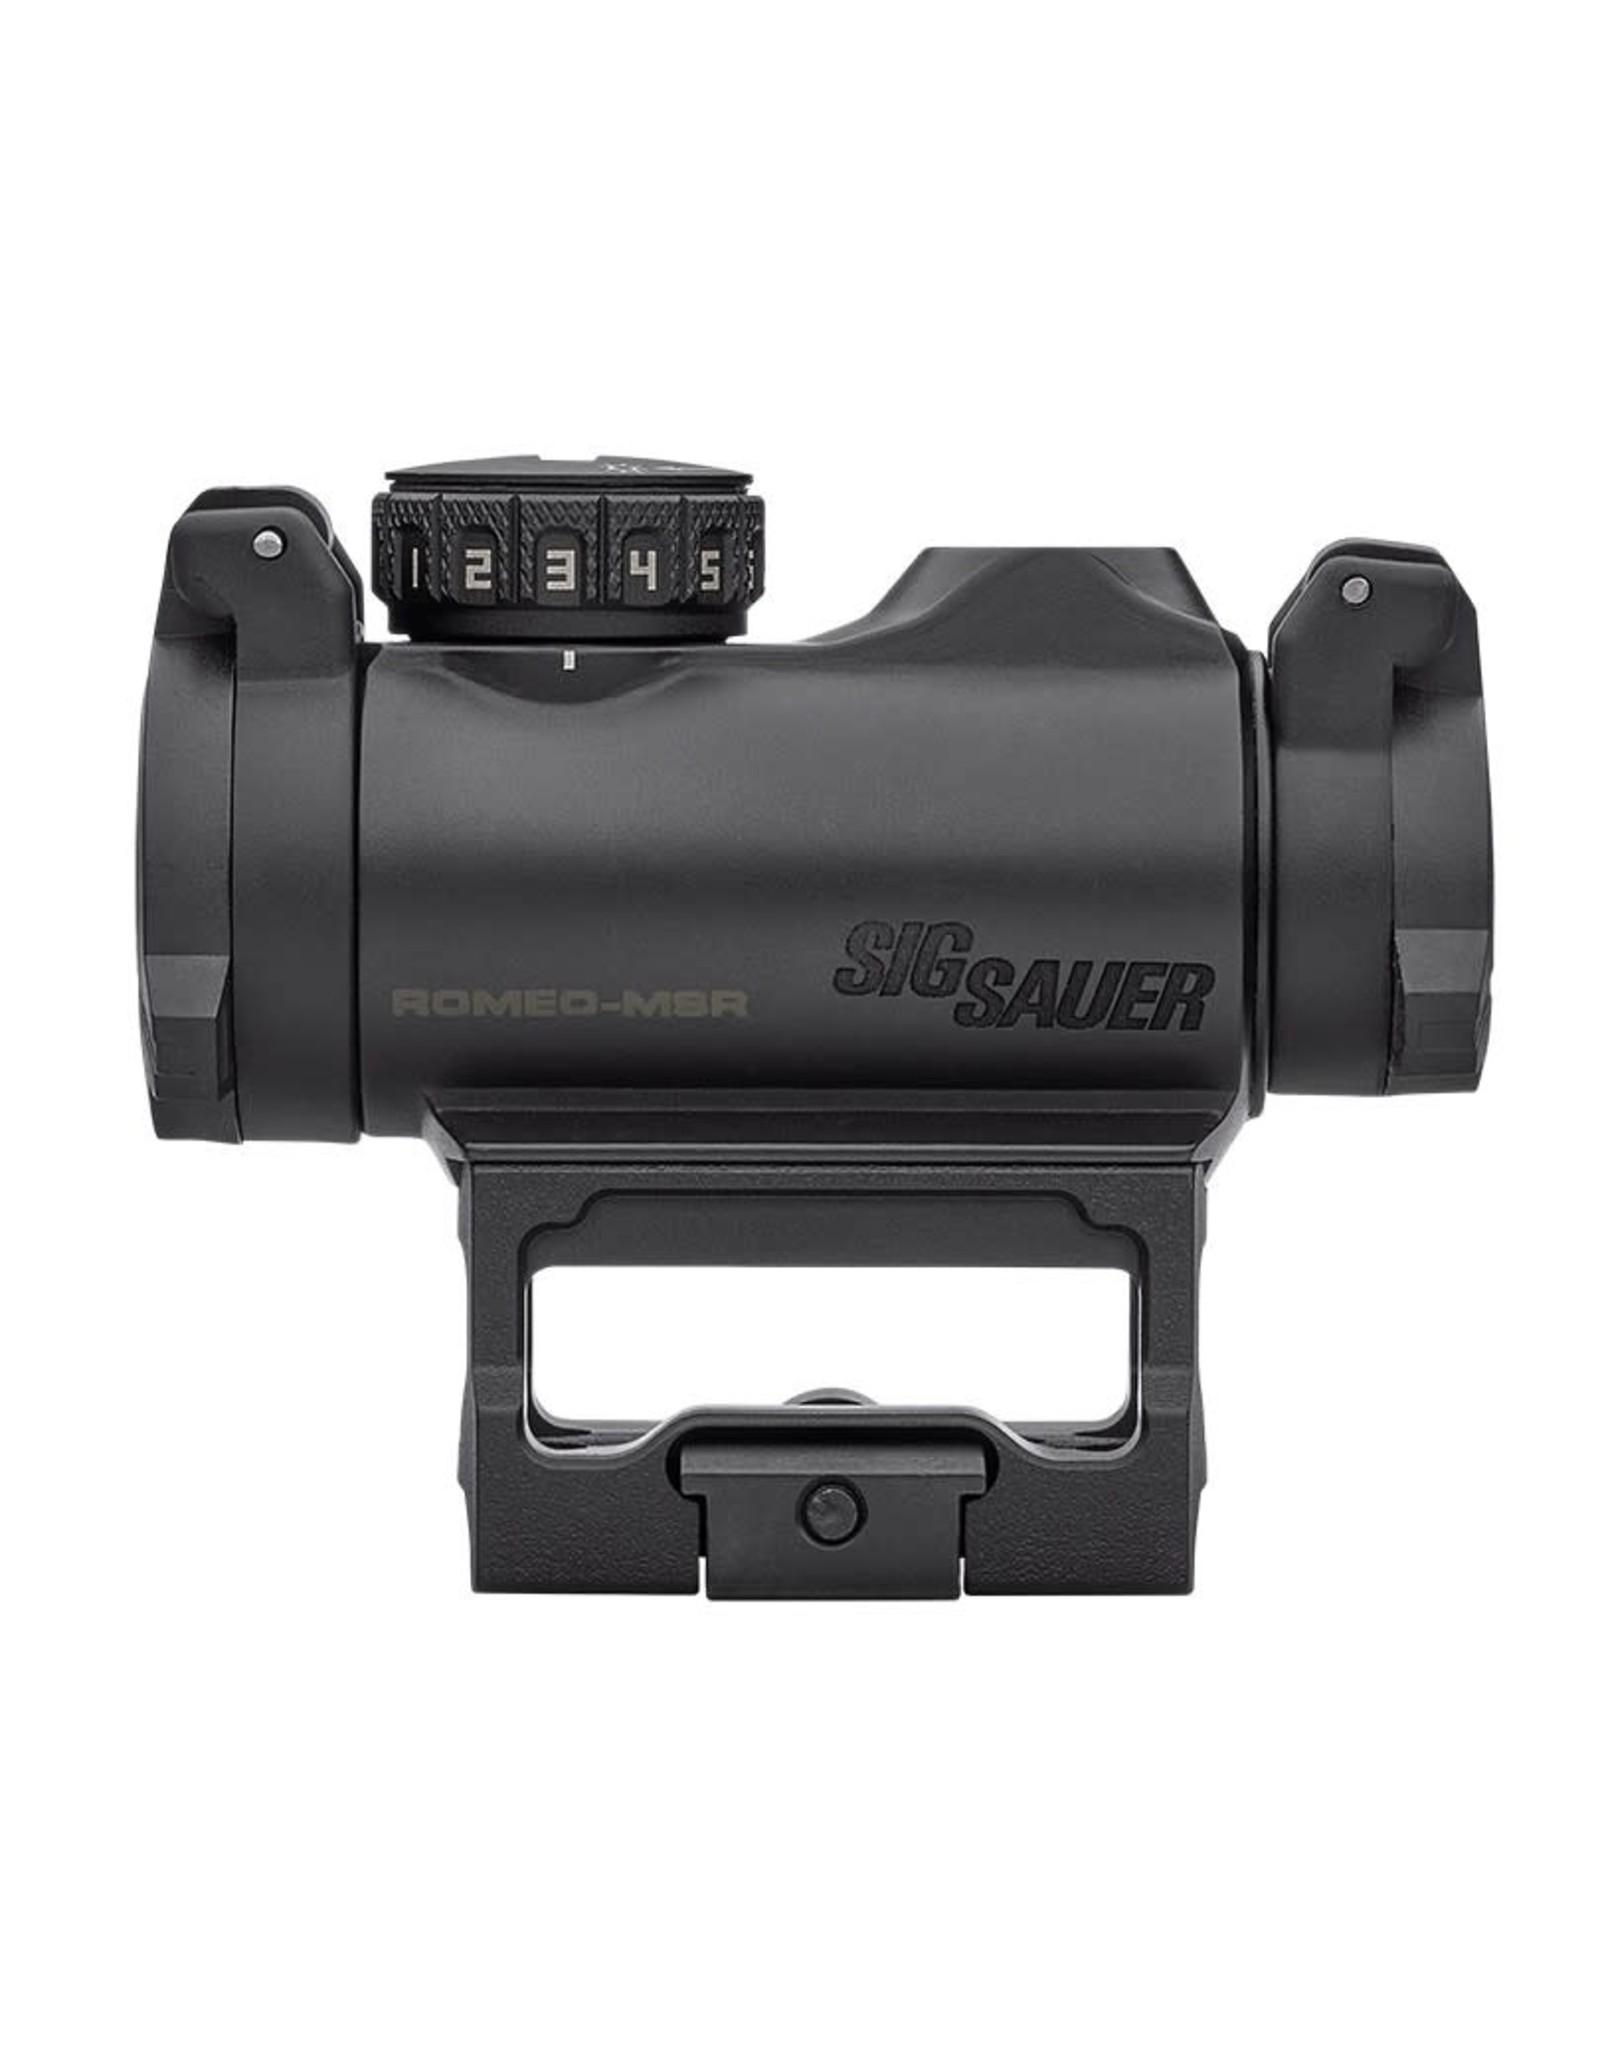 Sig Sauer Sig Sauer Romeo-MSR Compact Red Dot Sight